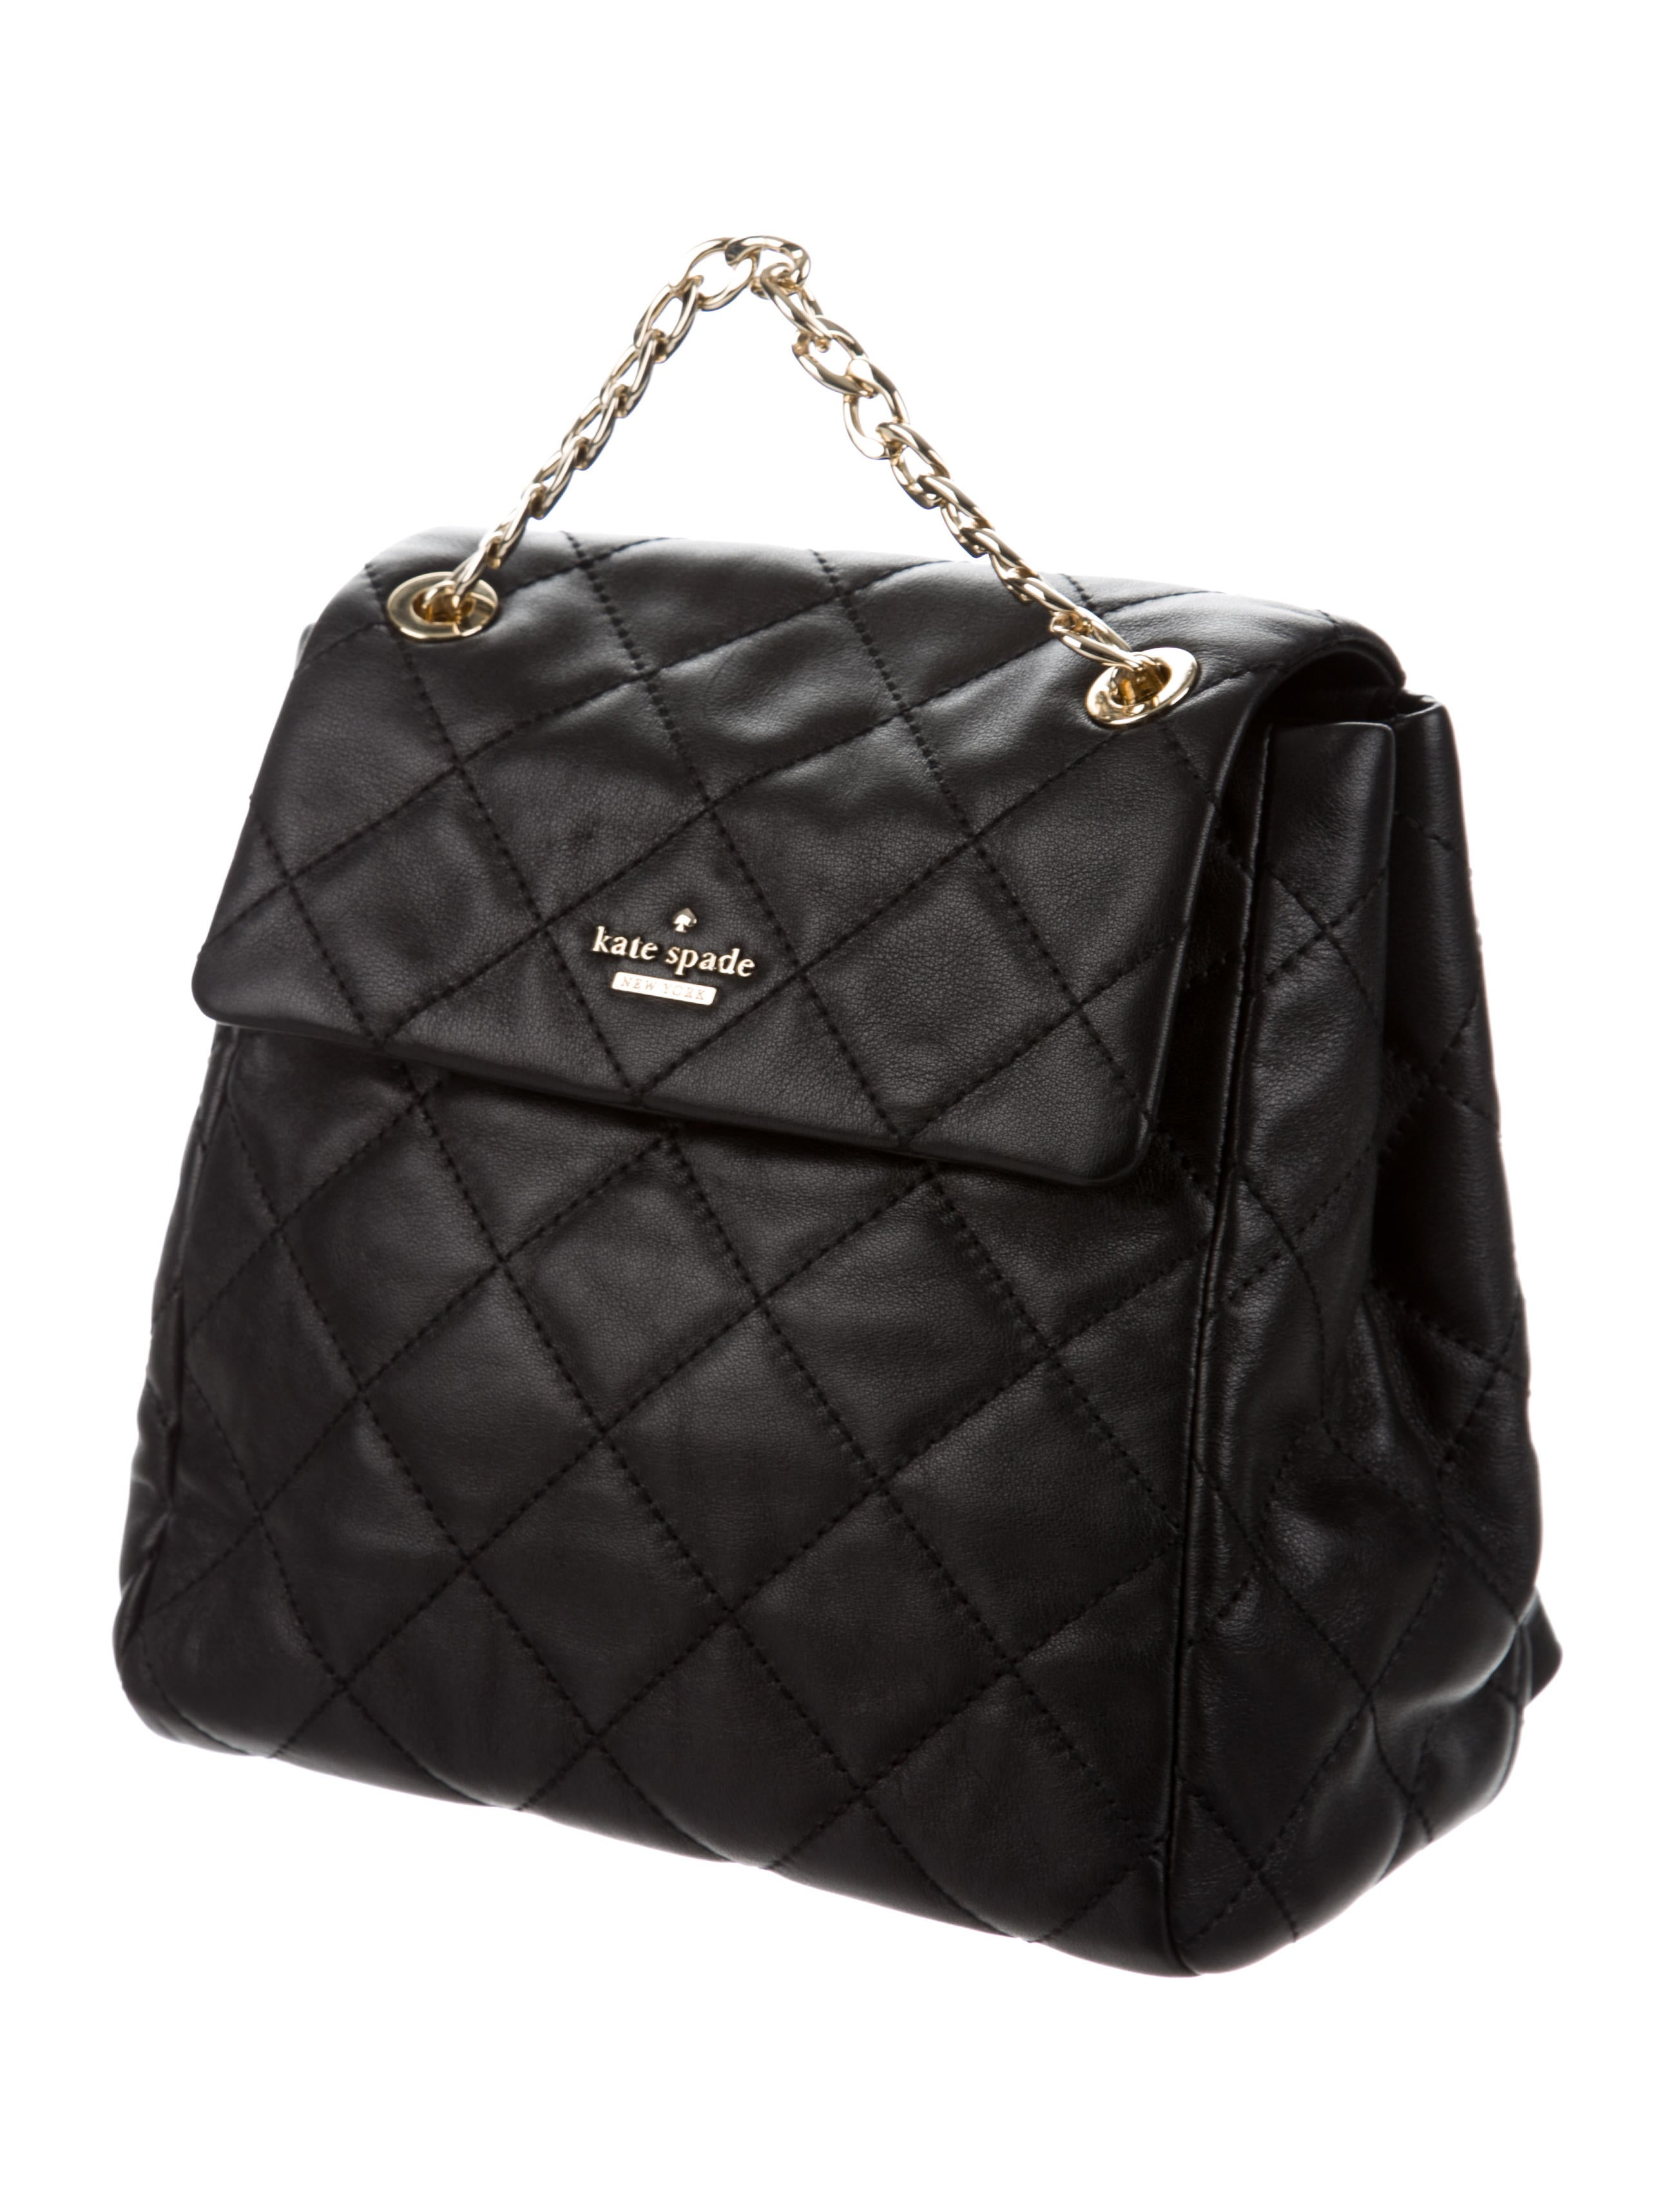 Backpack Kate Spade Handbags - Macy's